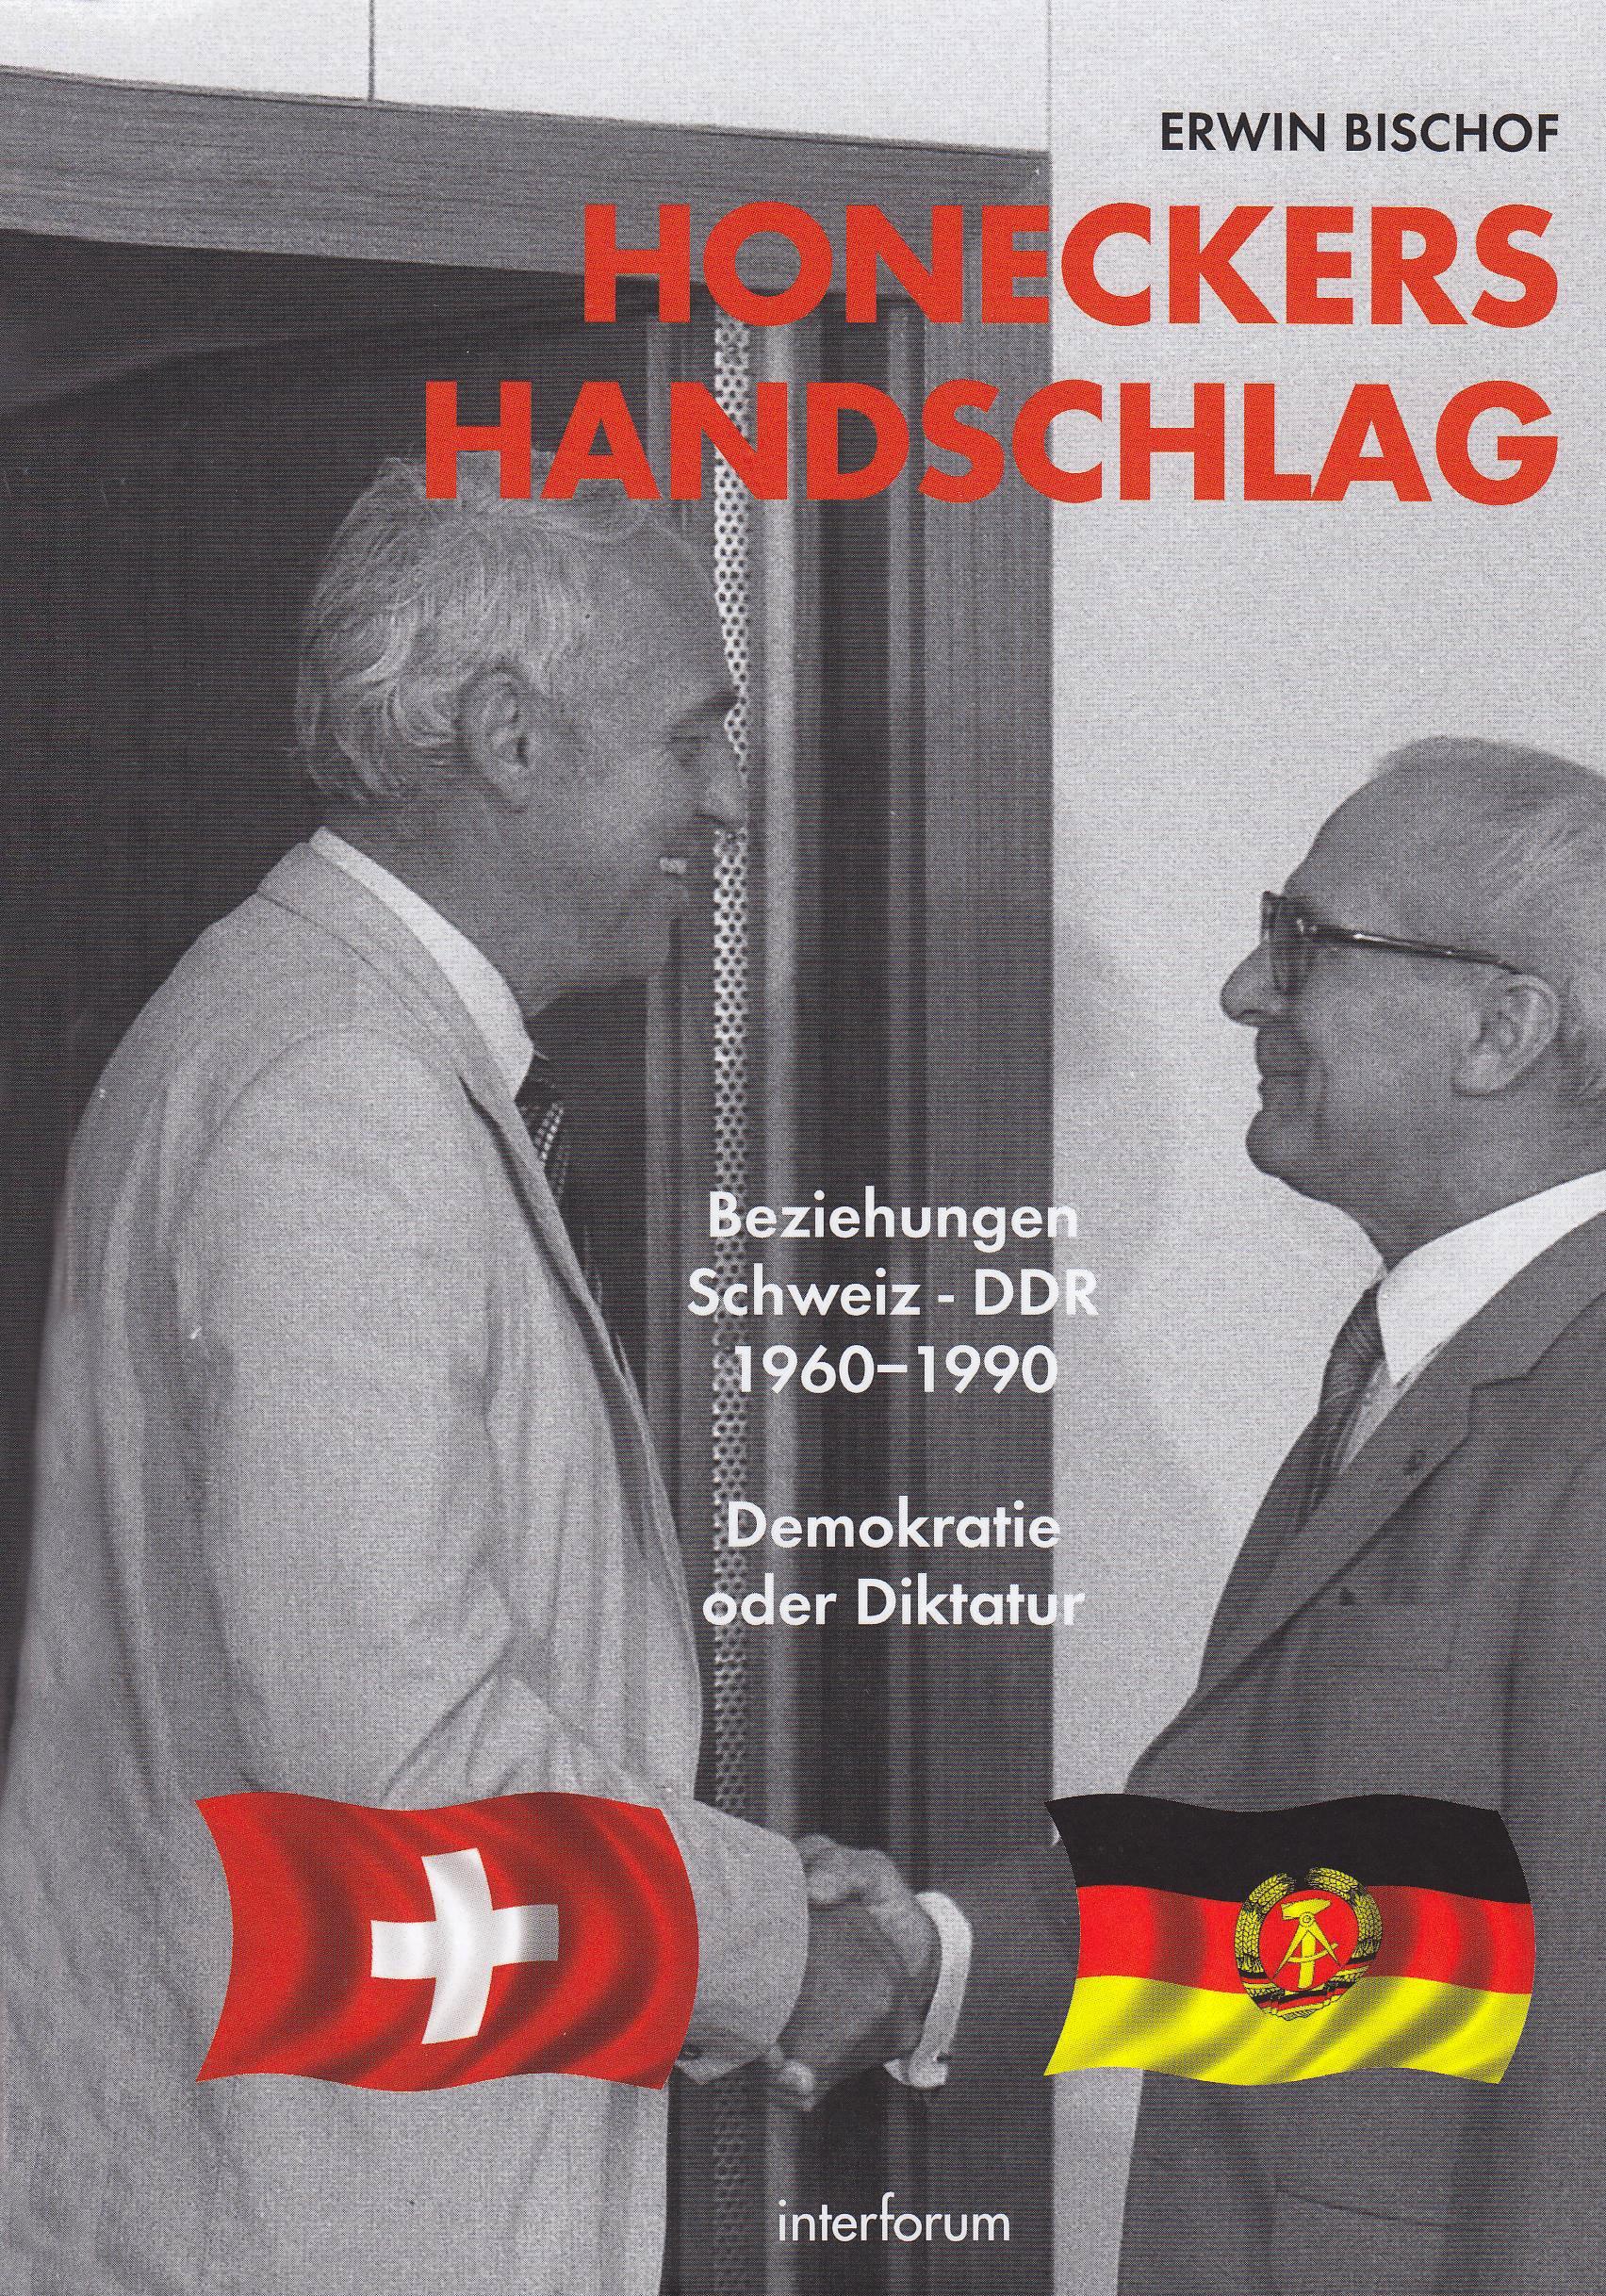 Honeckers Handschlag. Beziehungen Schweiz - DDR 1960-90: Demokratie oder Diktatur